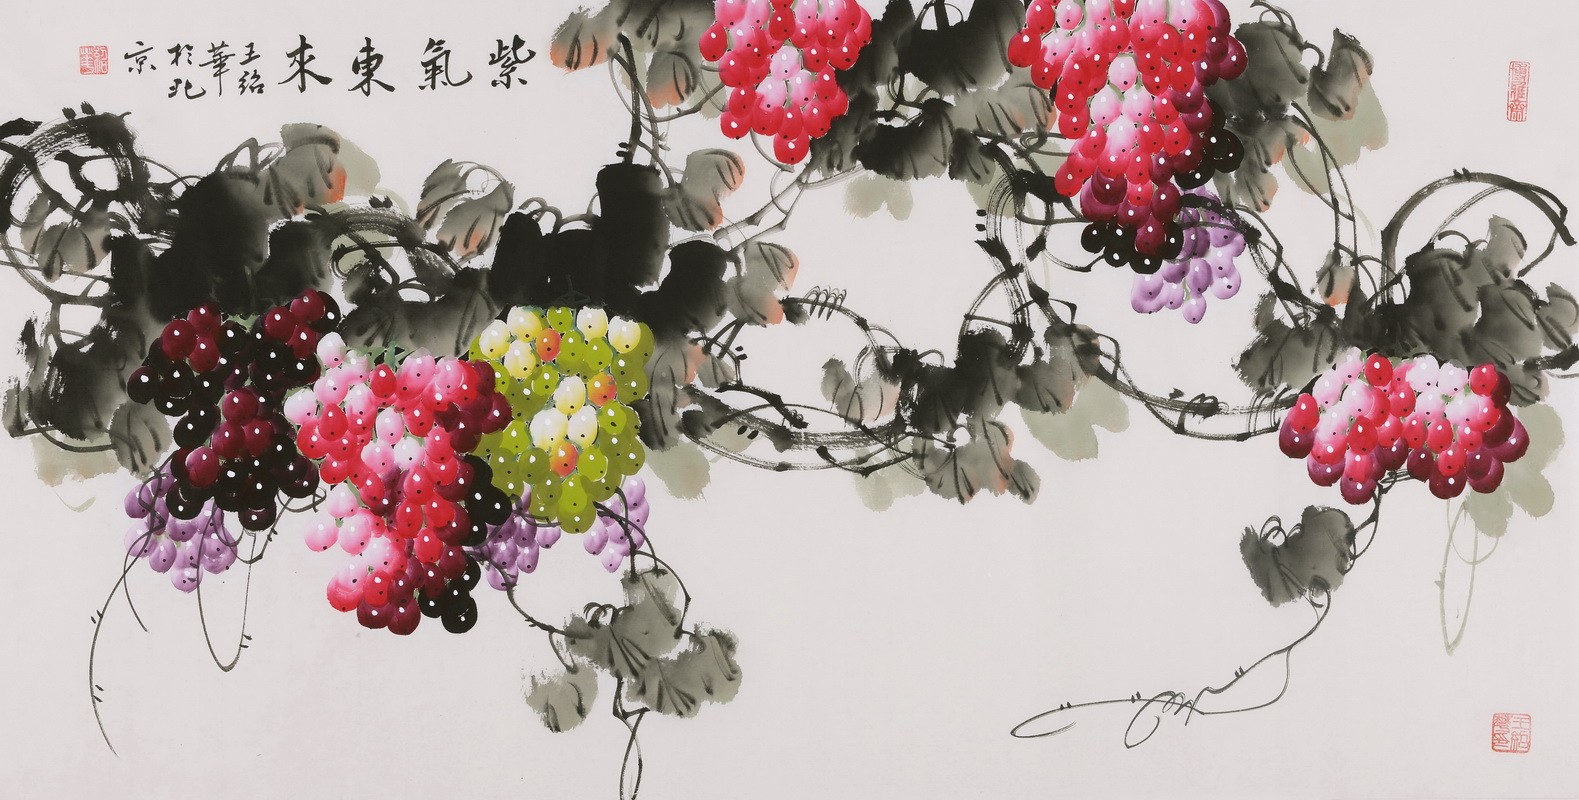 Grapes - CNAG003526